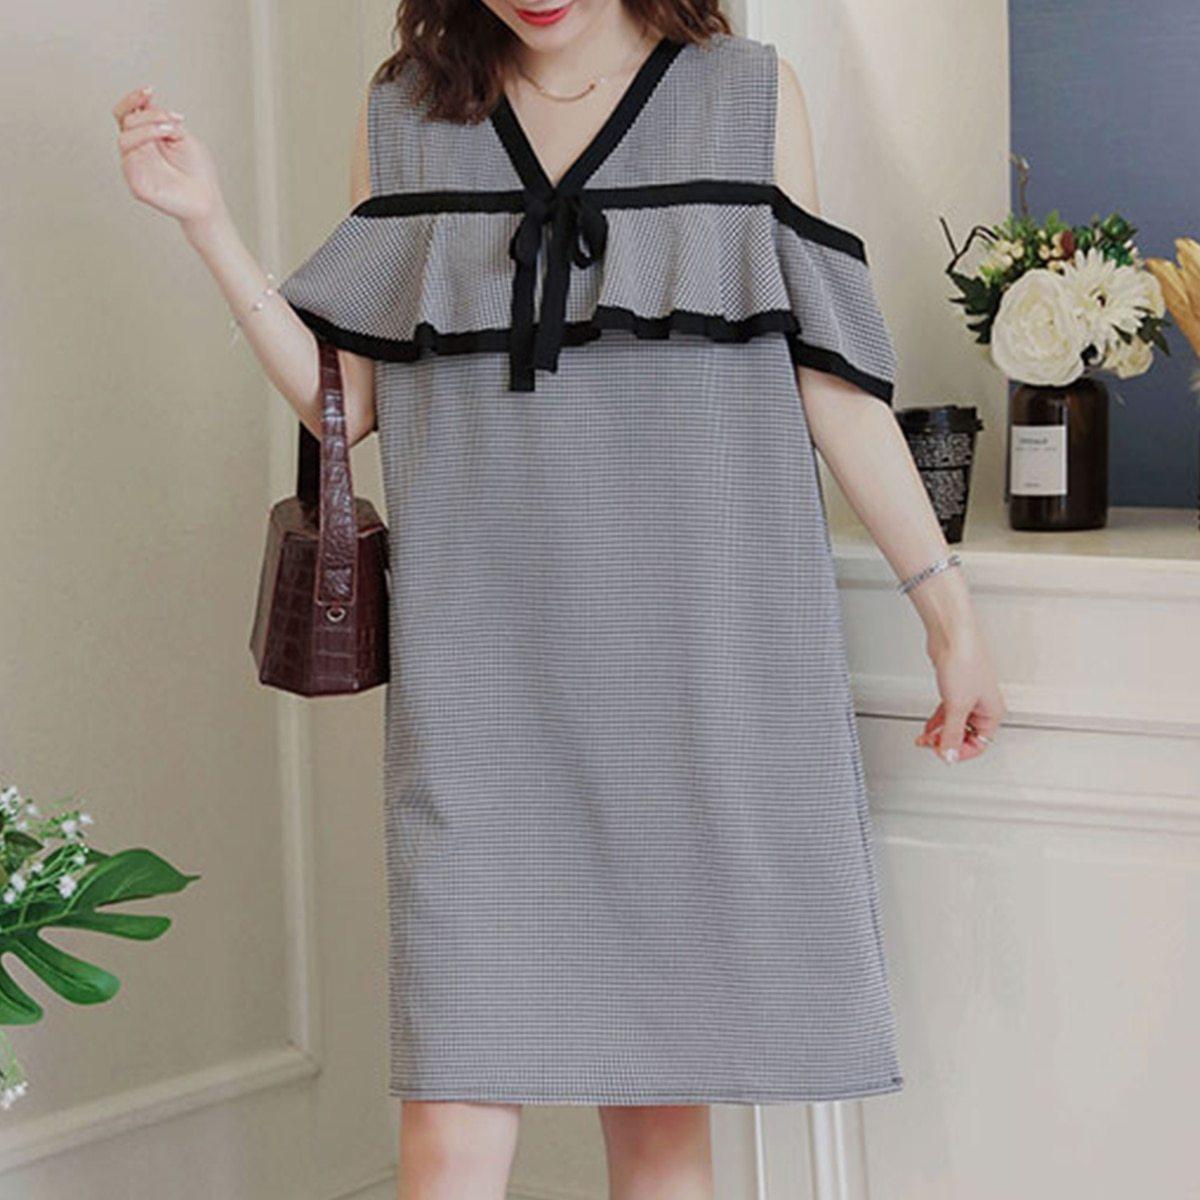 Maternity Dress Off The Shoulder Plaid Ruffles V-Neck Straight Dress image 2